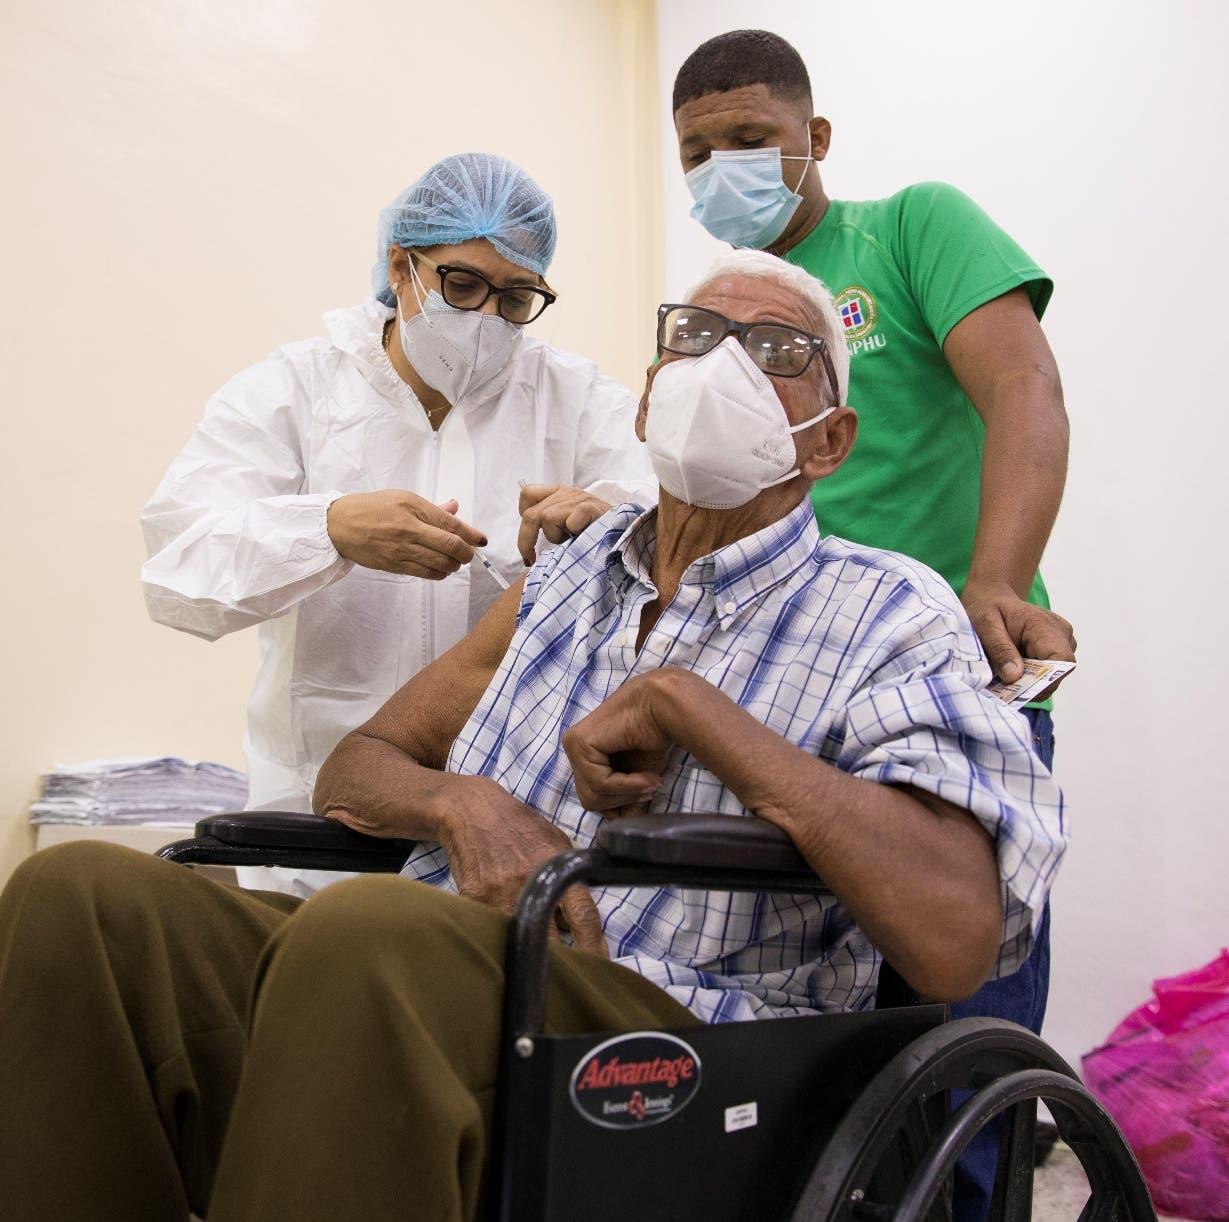 Gobierno anuncia tercera dosis inicia de inmediato